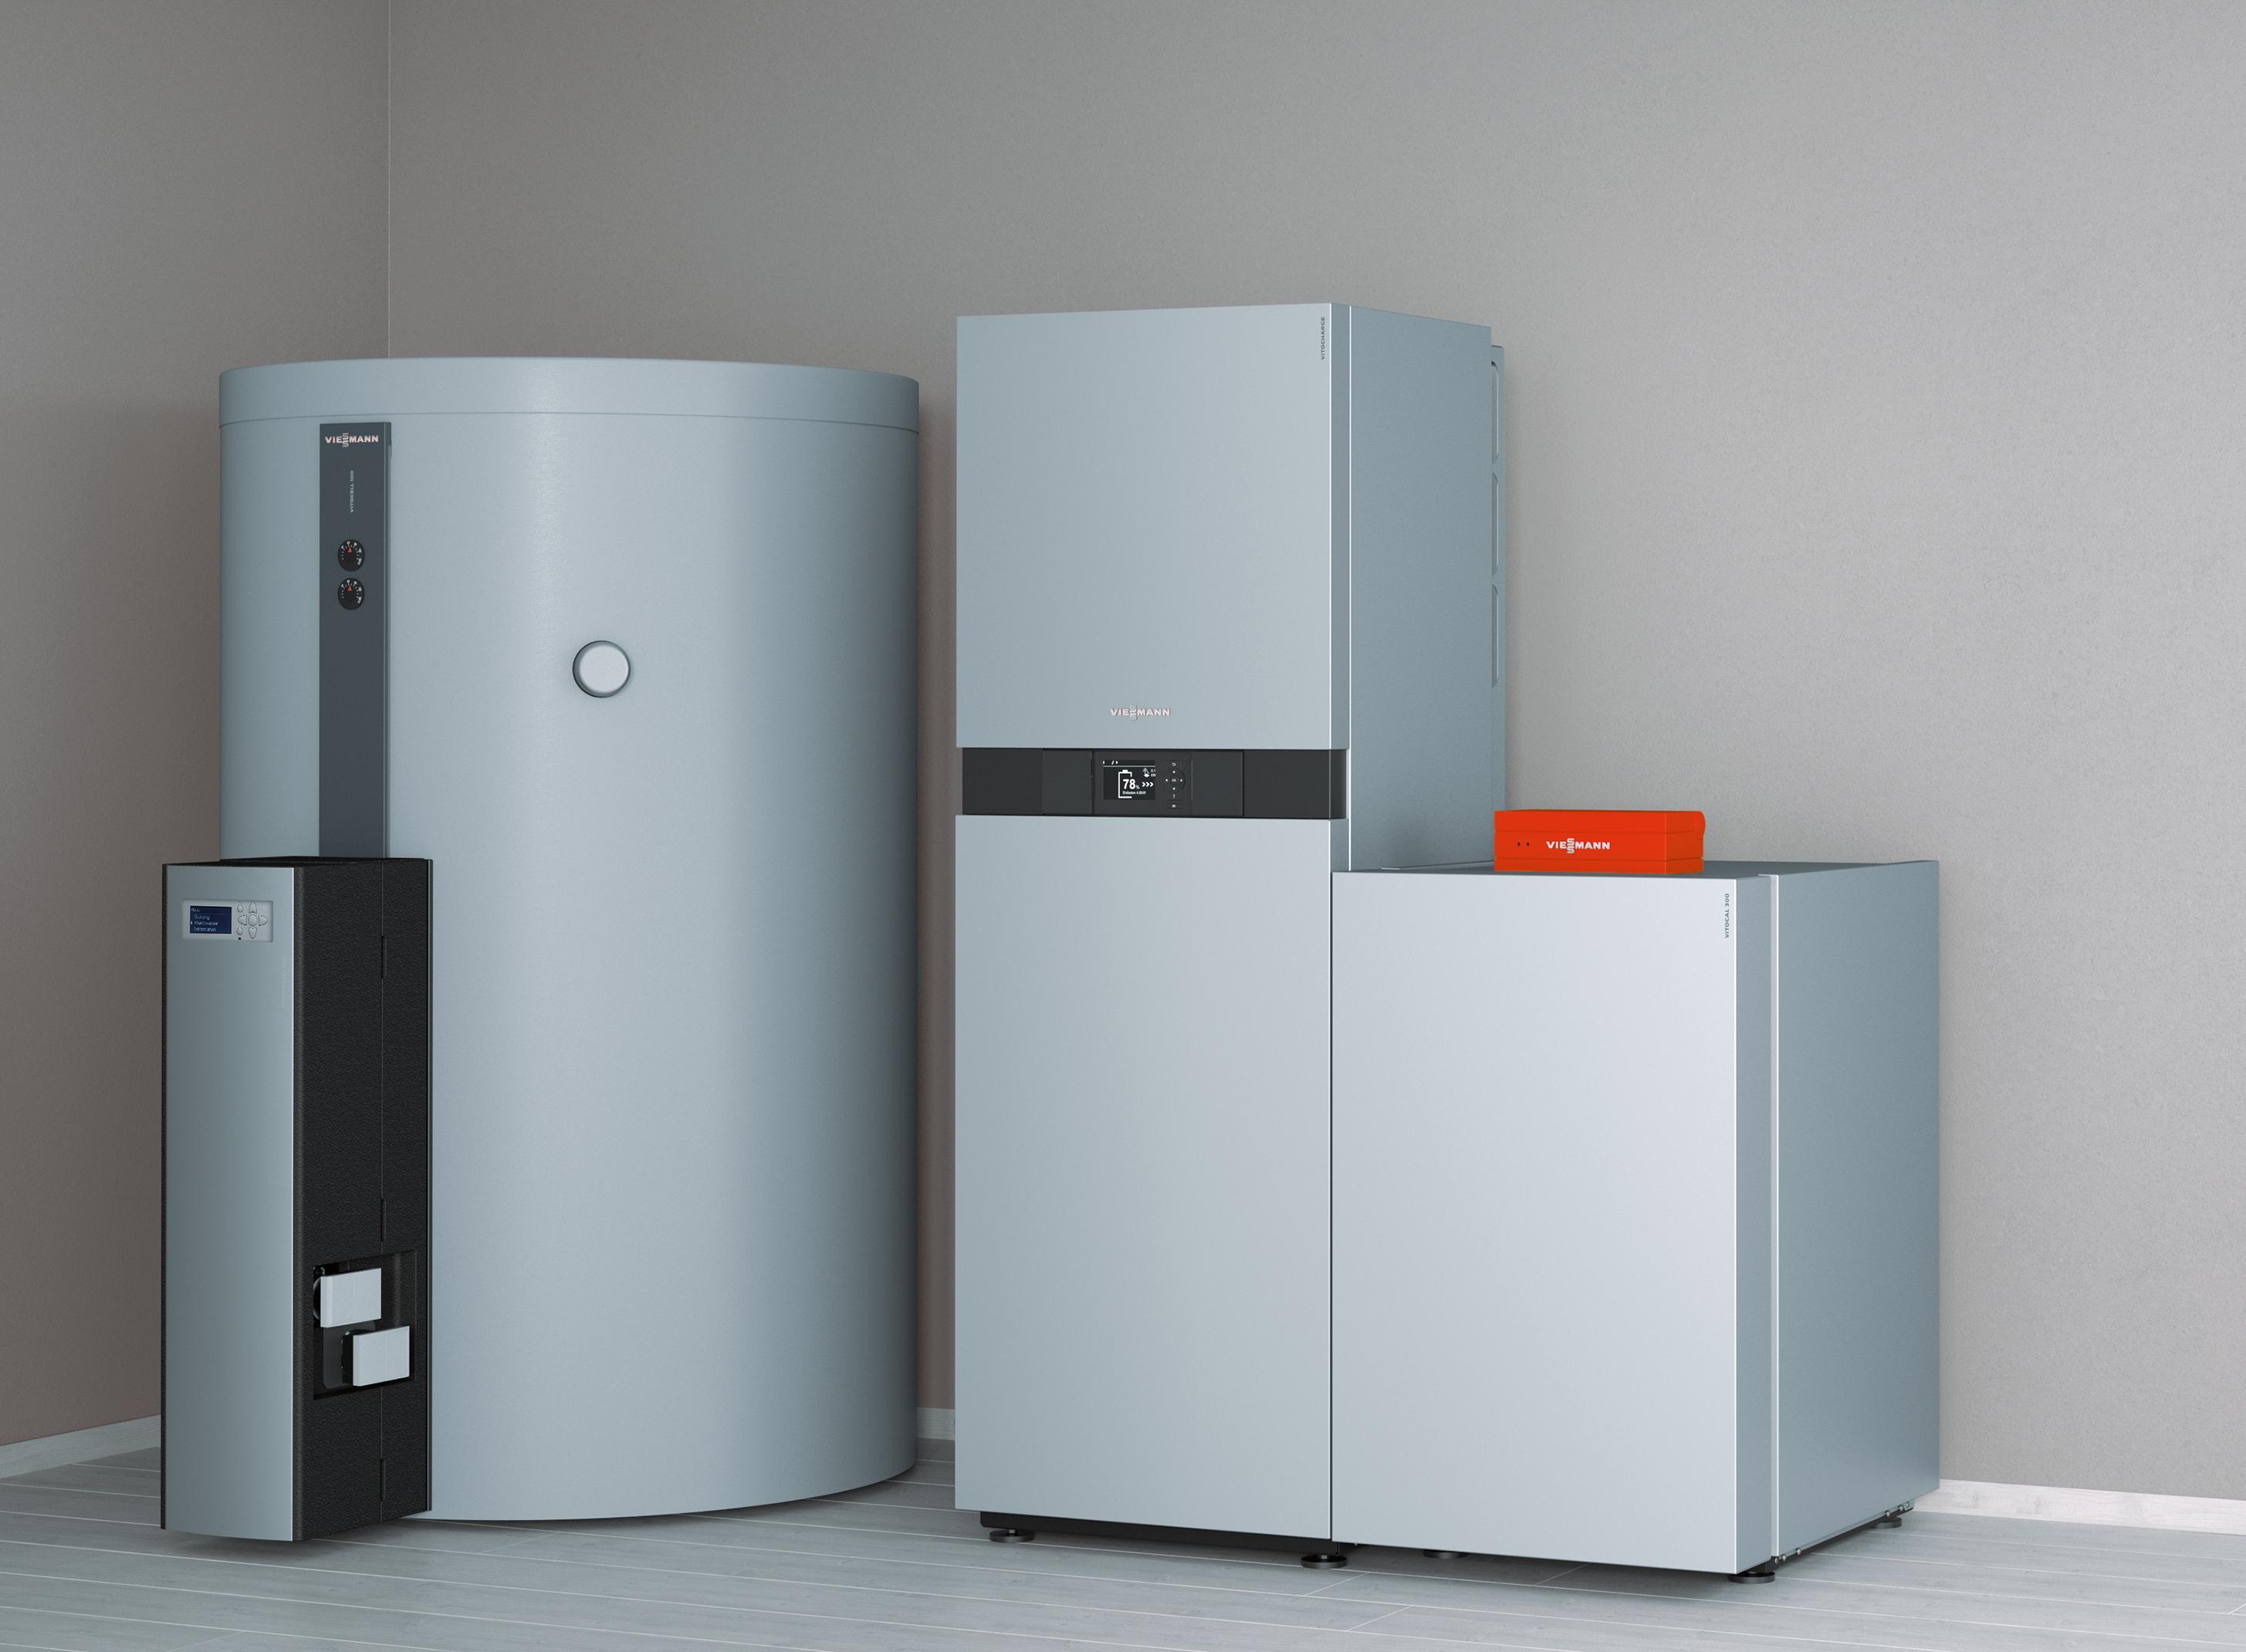 Газовый котел висман витопенд 100-w неисправности, отзывы, инструкция по эксплуатации и настройке модели a1hb001, a1jb010, a1jb009